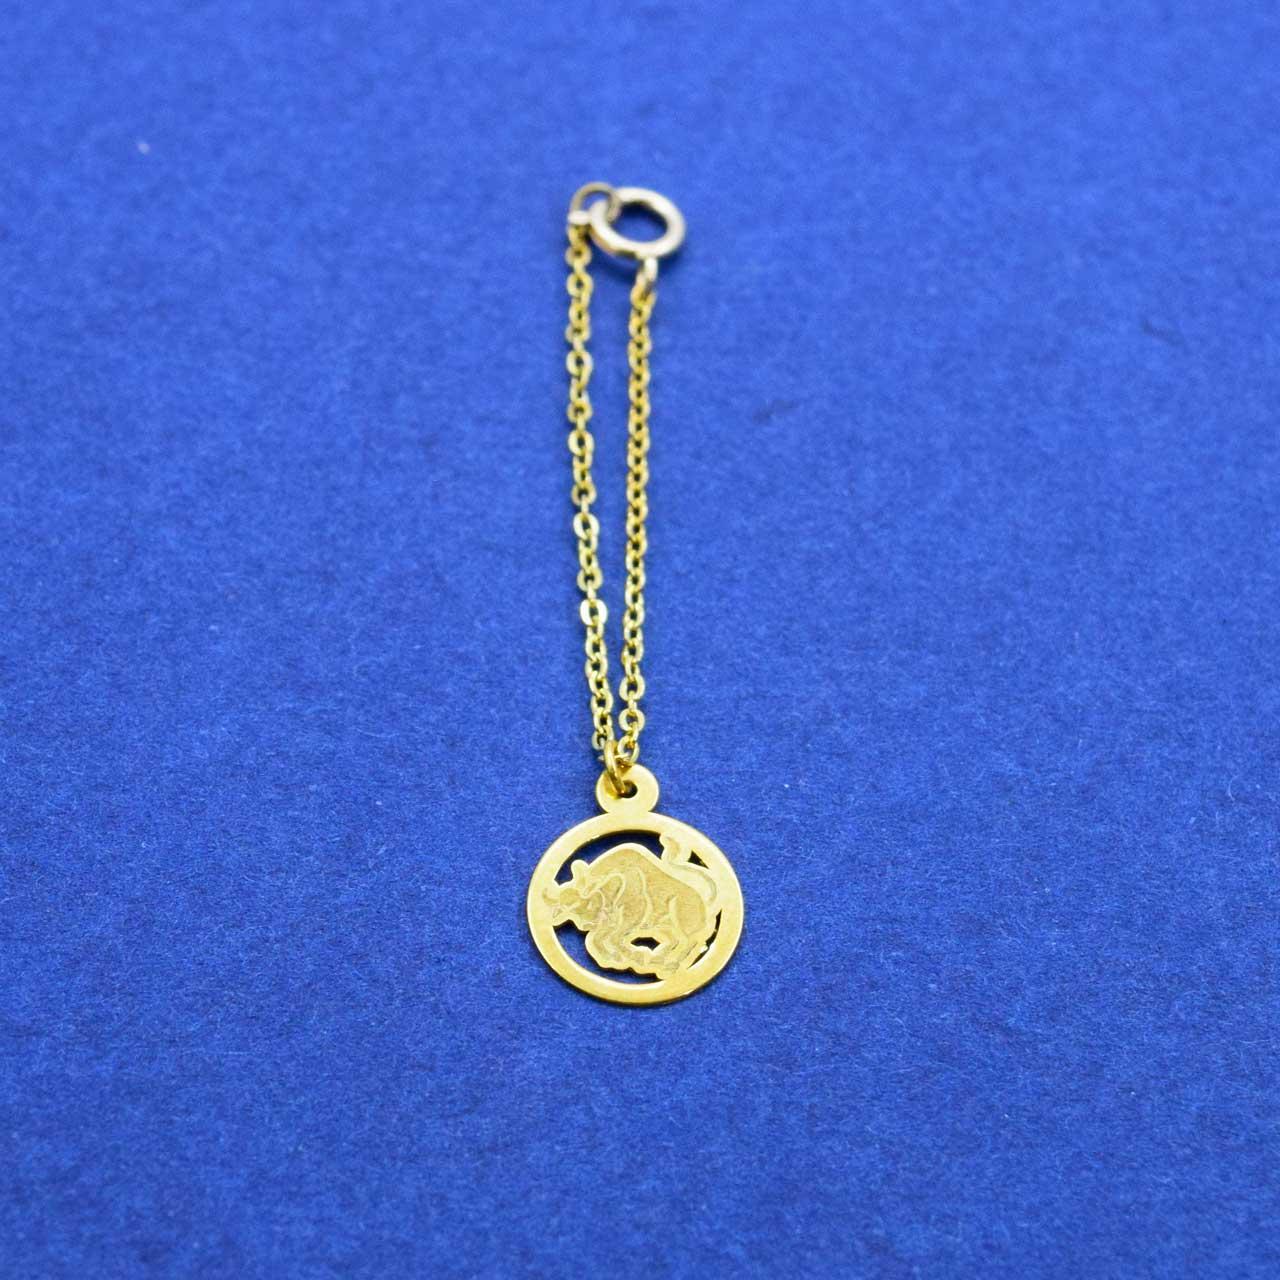 آویز ساعت طلا 18 عیار زنانه کانیار گالری مدل AS87